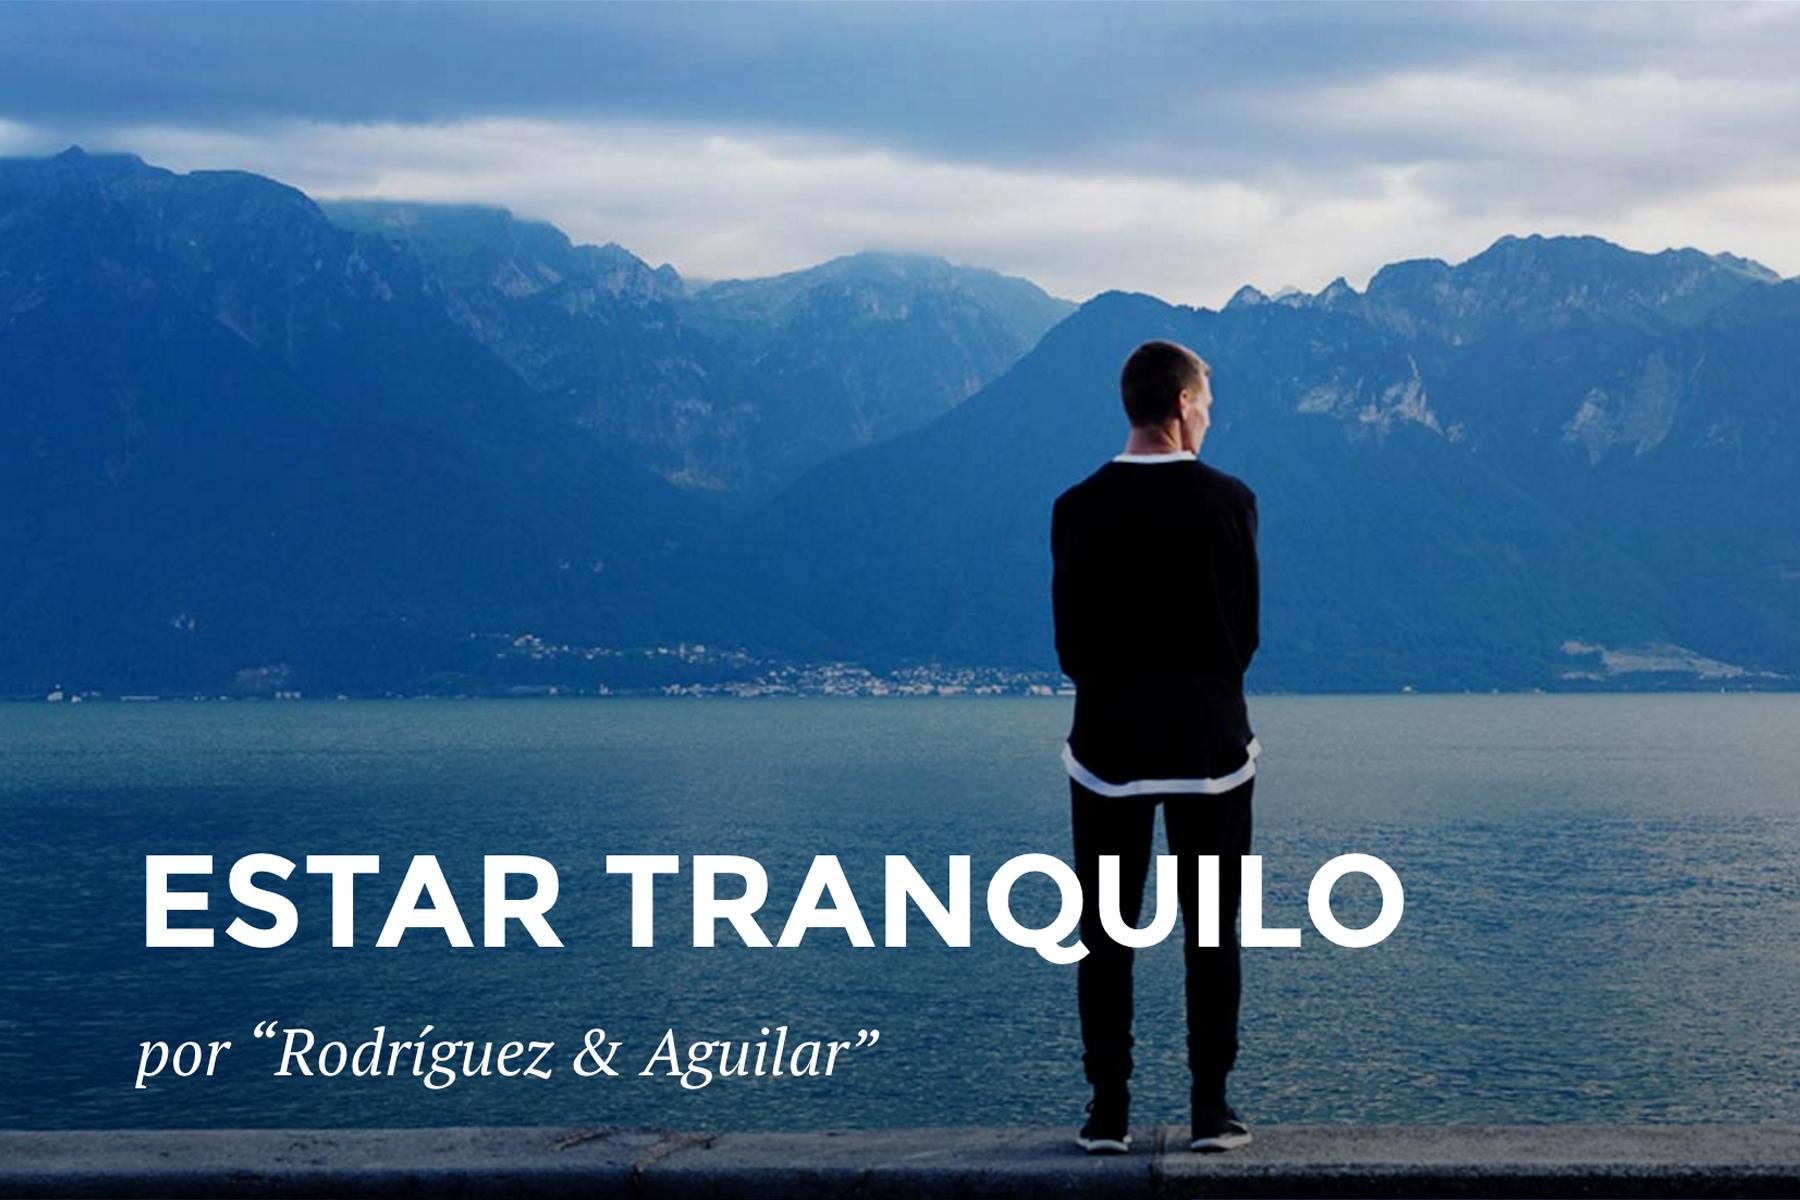 Rodriguez & Aguilar